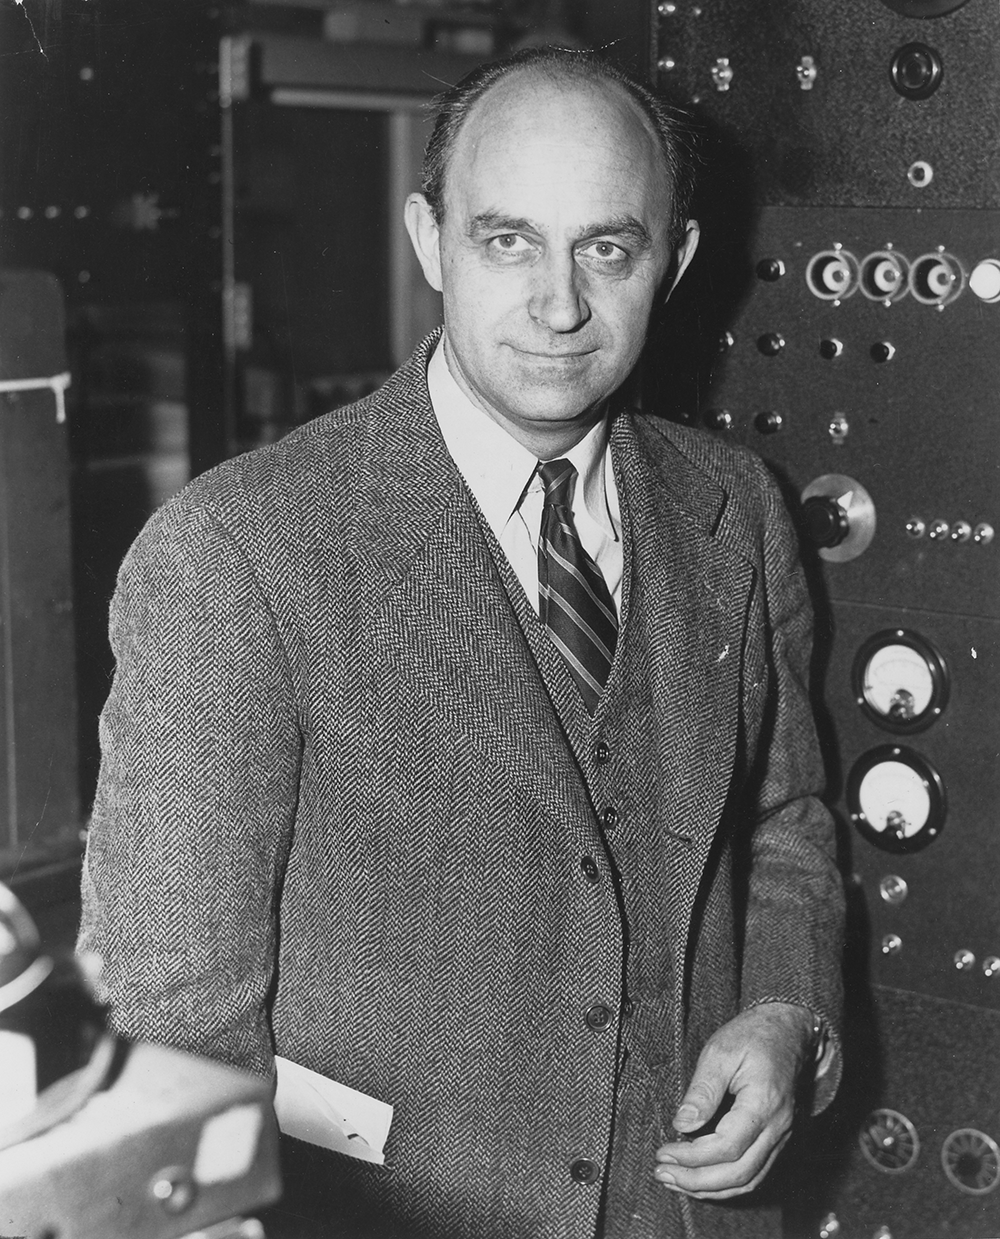 Enrico Fermi, c. 1946. National Archives, U.S. Department of Energy, Office of Public Affairs.